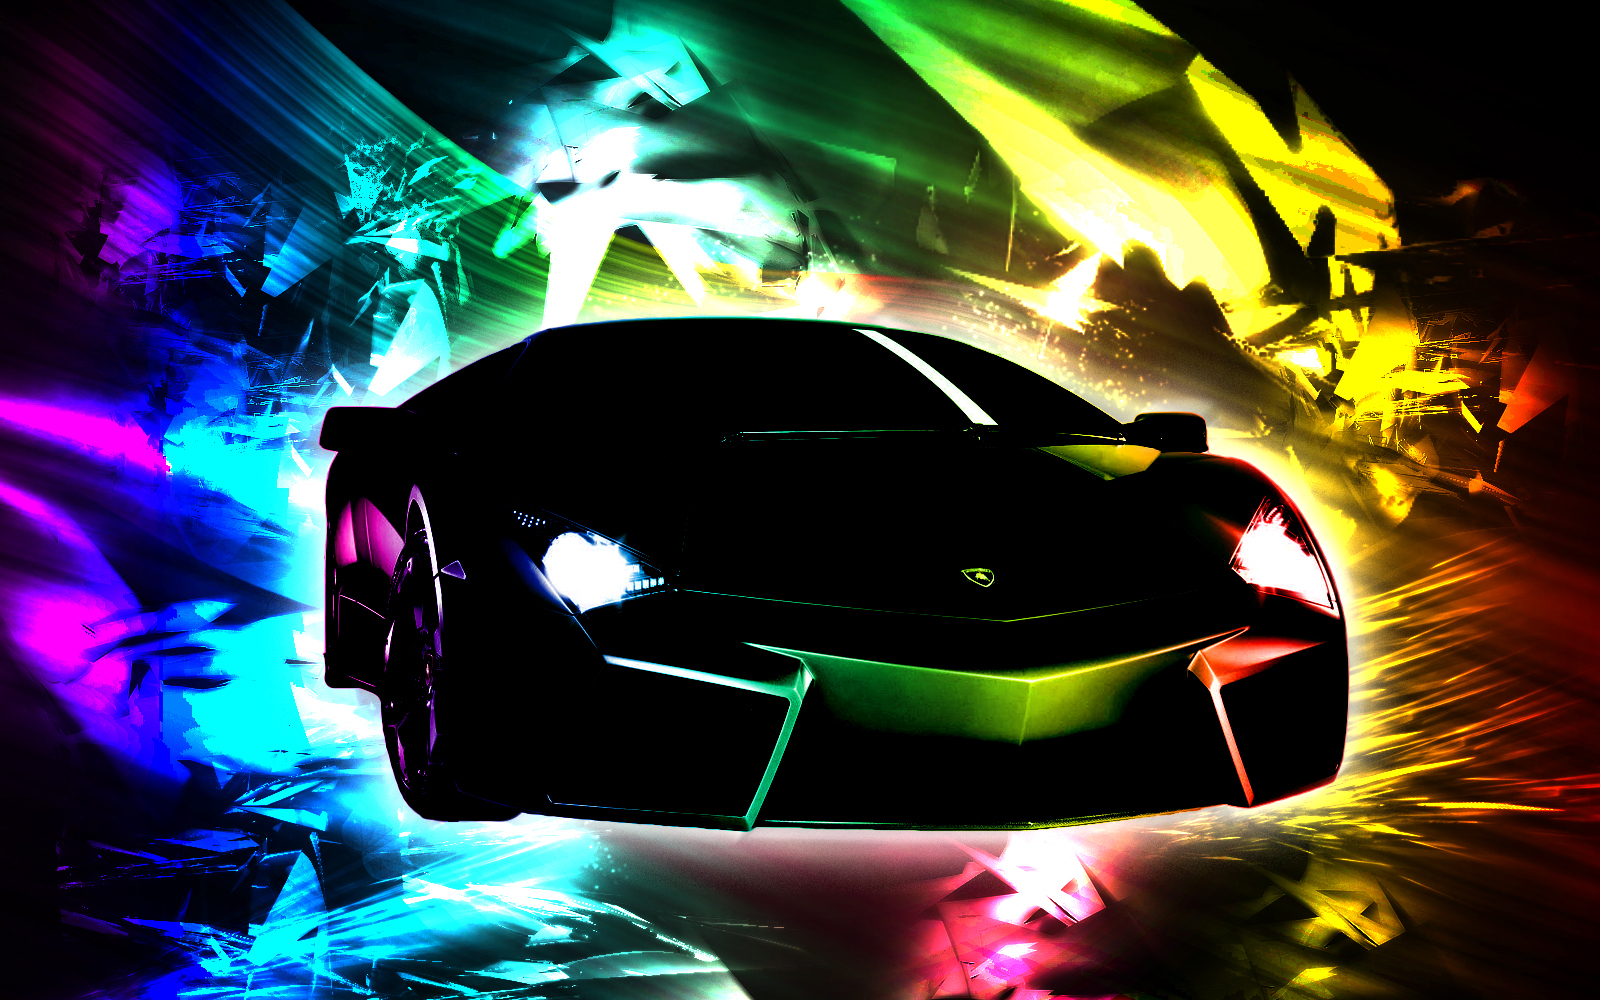 http://3.bp.blogspot.com/_fbqoORBnBZw/TMZHOtbuEZI/AAAAAAAAABQ/1VJGnERMyu4/s1600/Lamborghini_Reventon_Wallpaper_by_SmashingDesign%5B1%5D.jpg